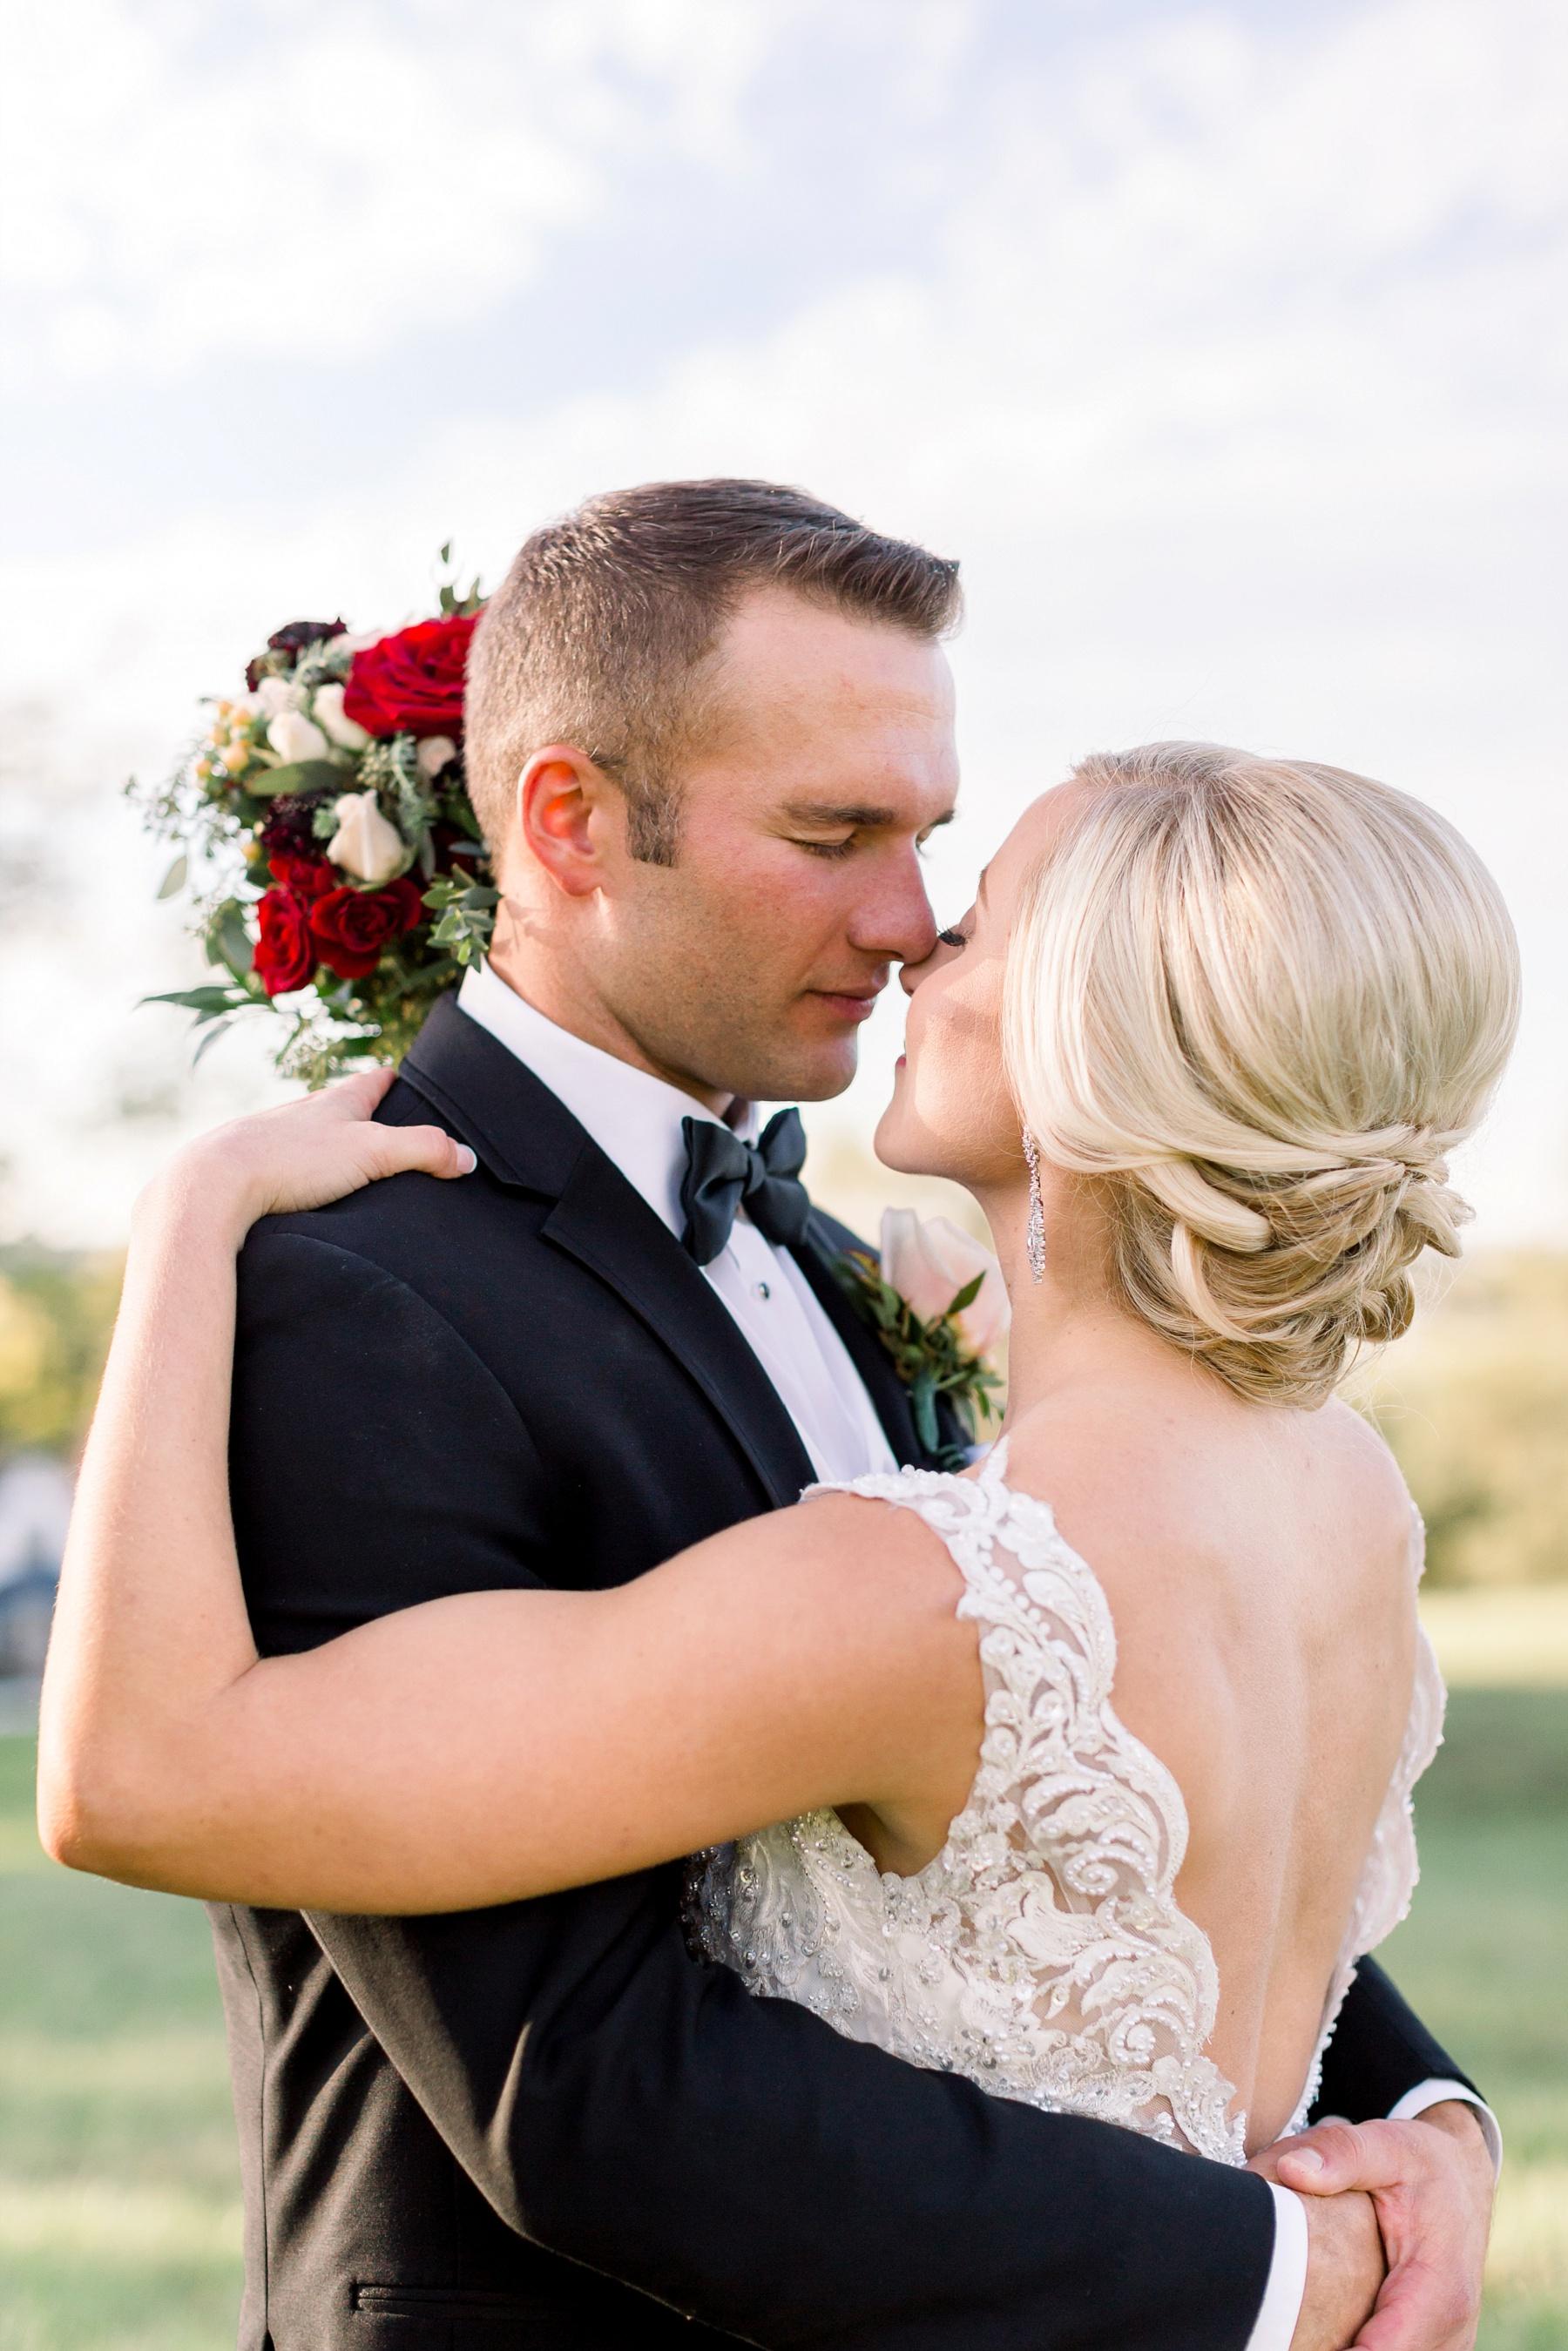 midwest-adventurous-wedding-photographer-elizabeth-ladean-photography-photo_4799.jpg